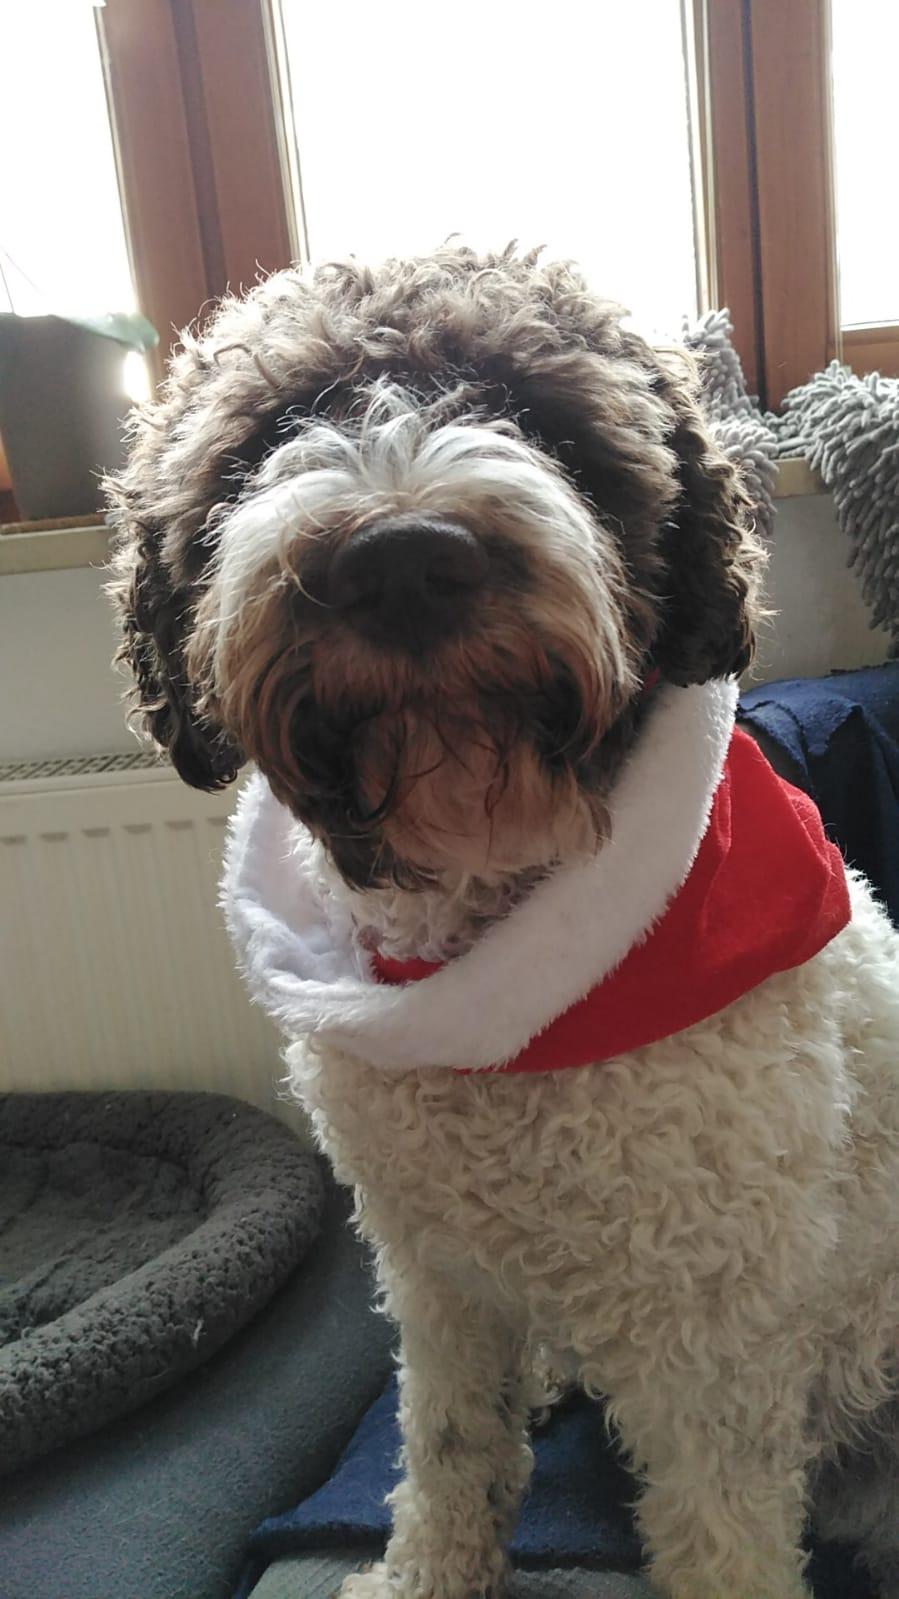 Merry Christmas vom Dorle